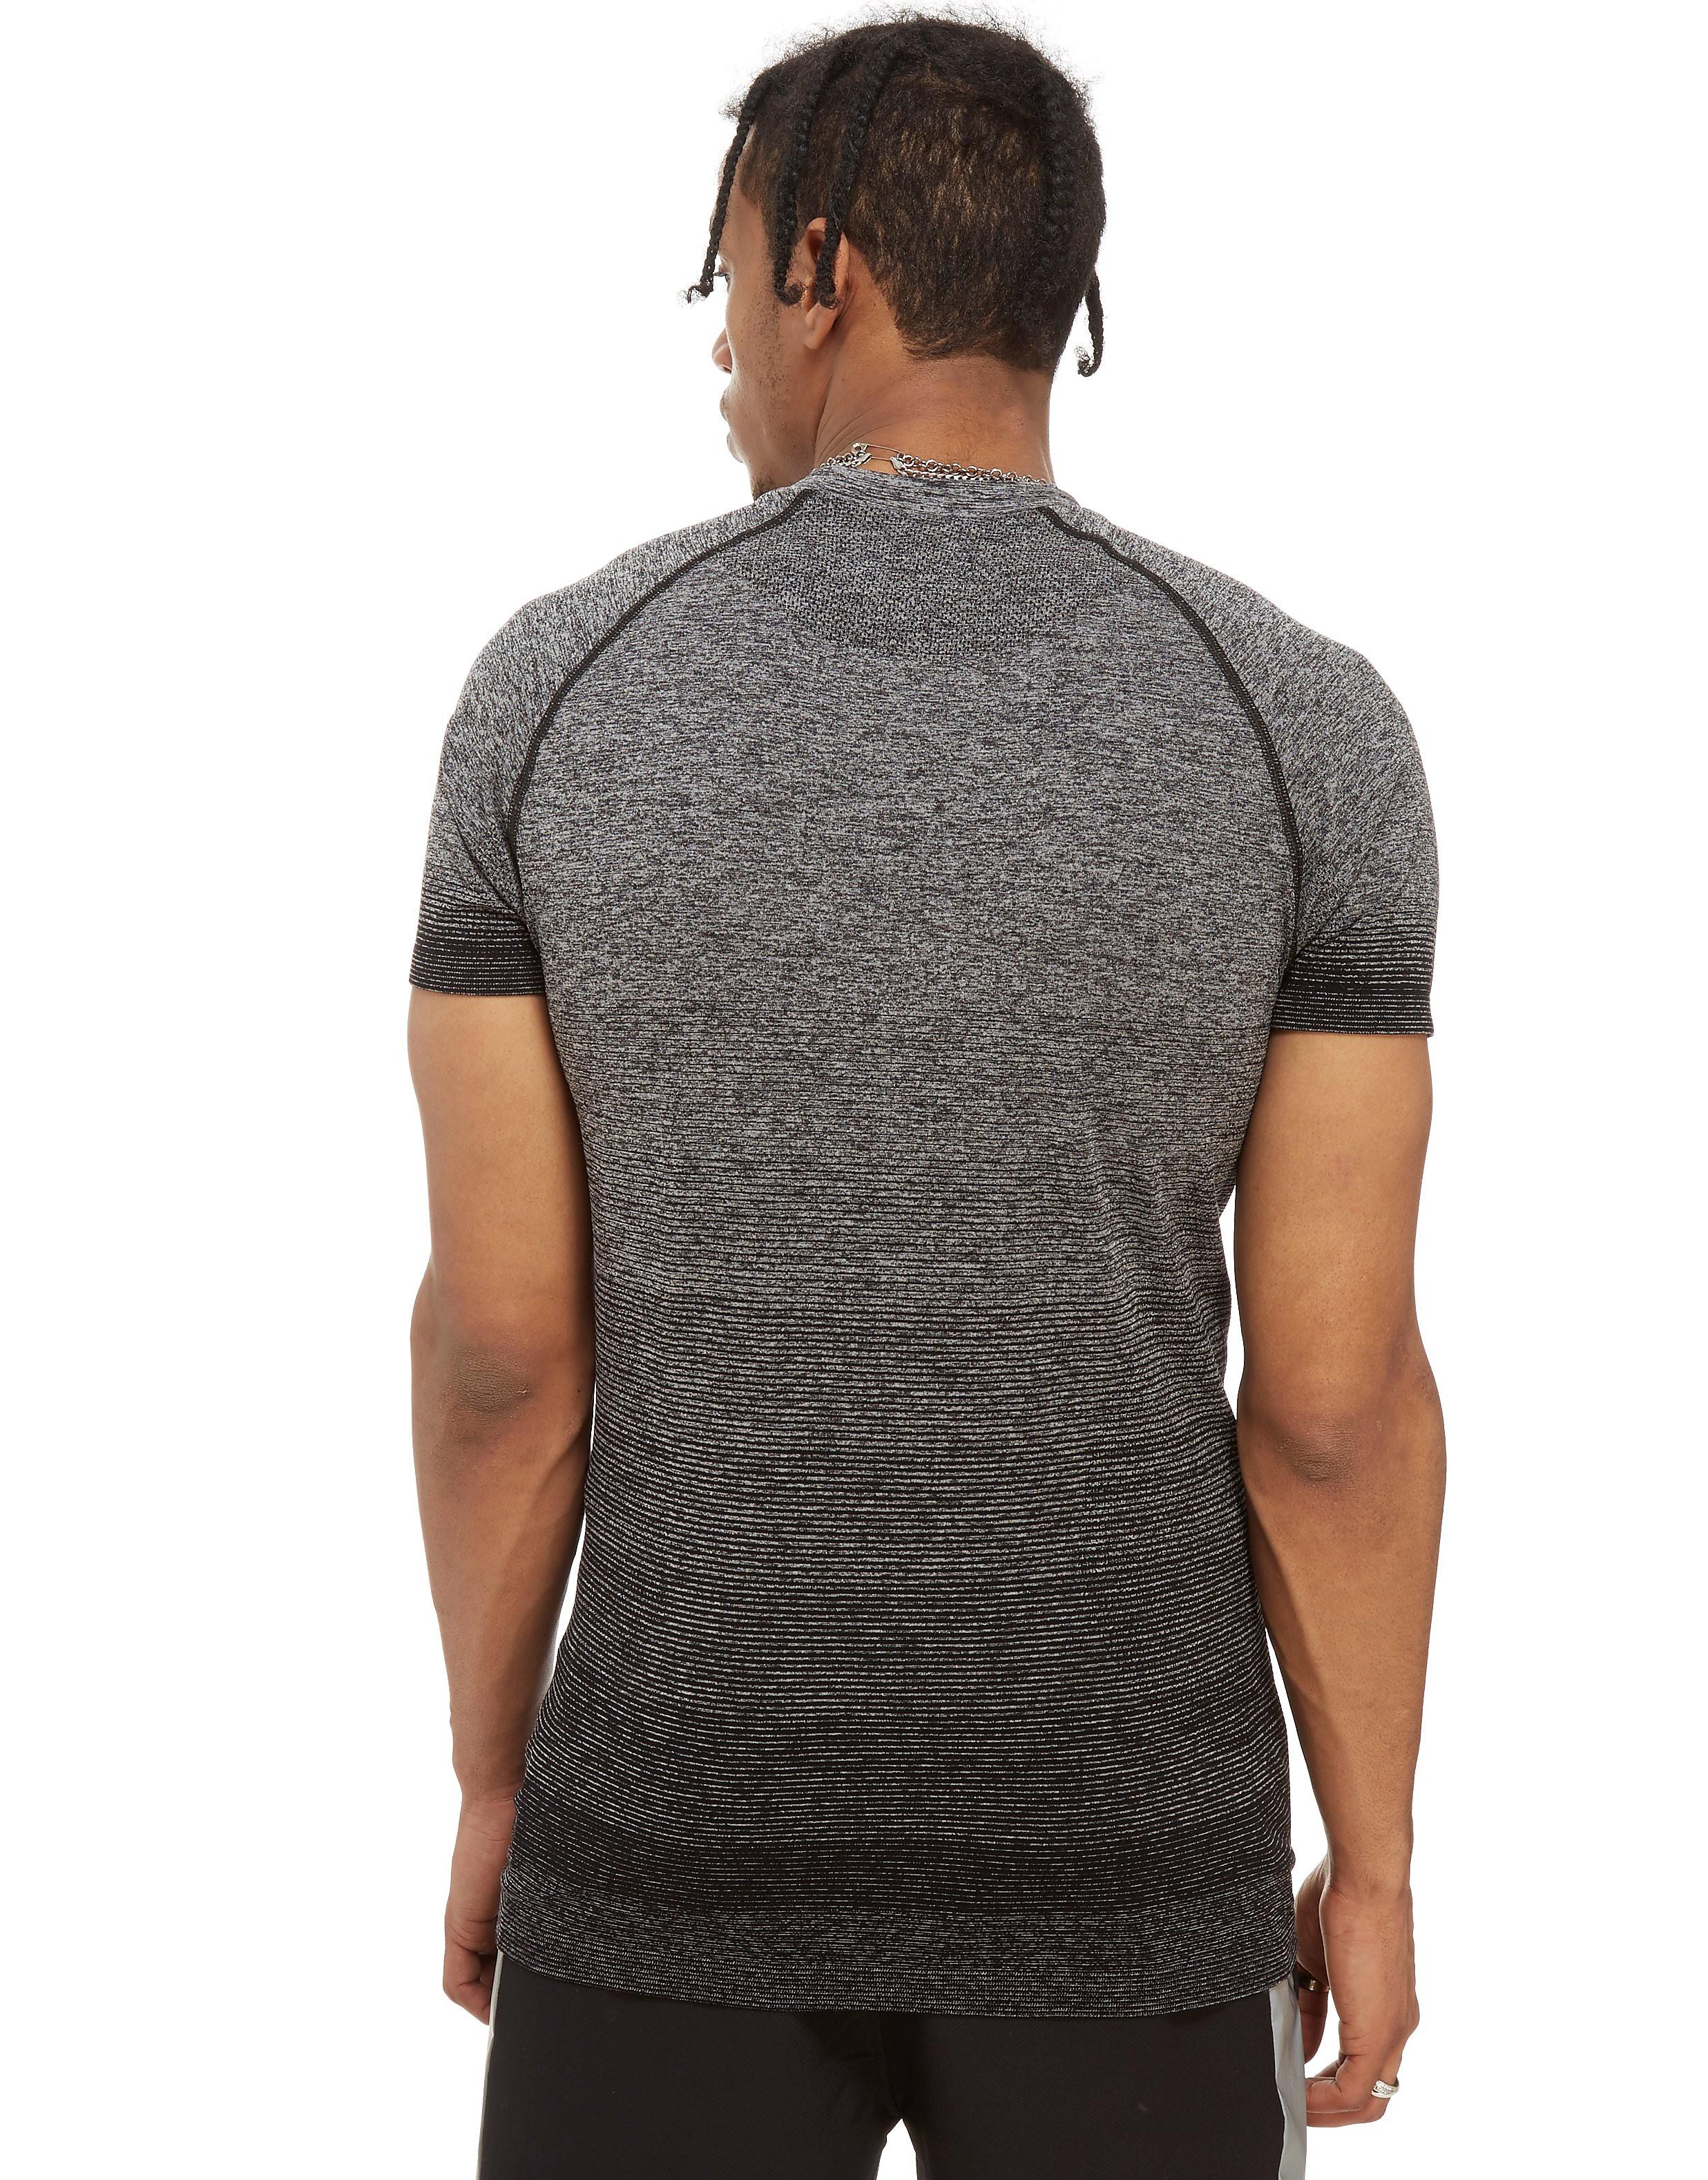 Align Fleetwing Short Sleeve T-Shirt